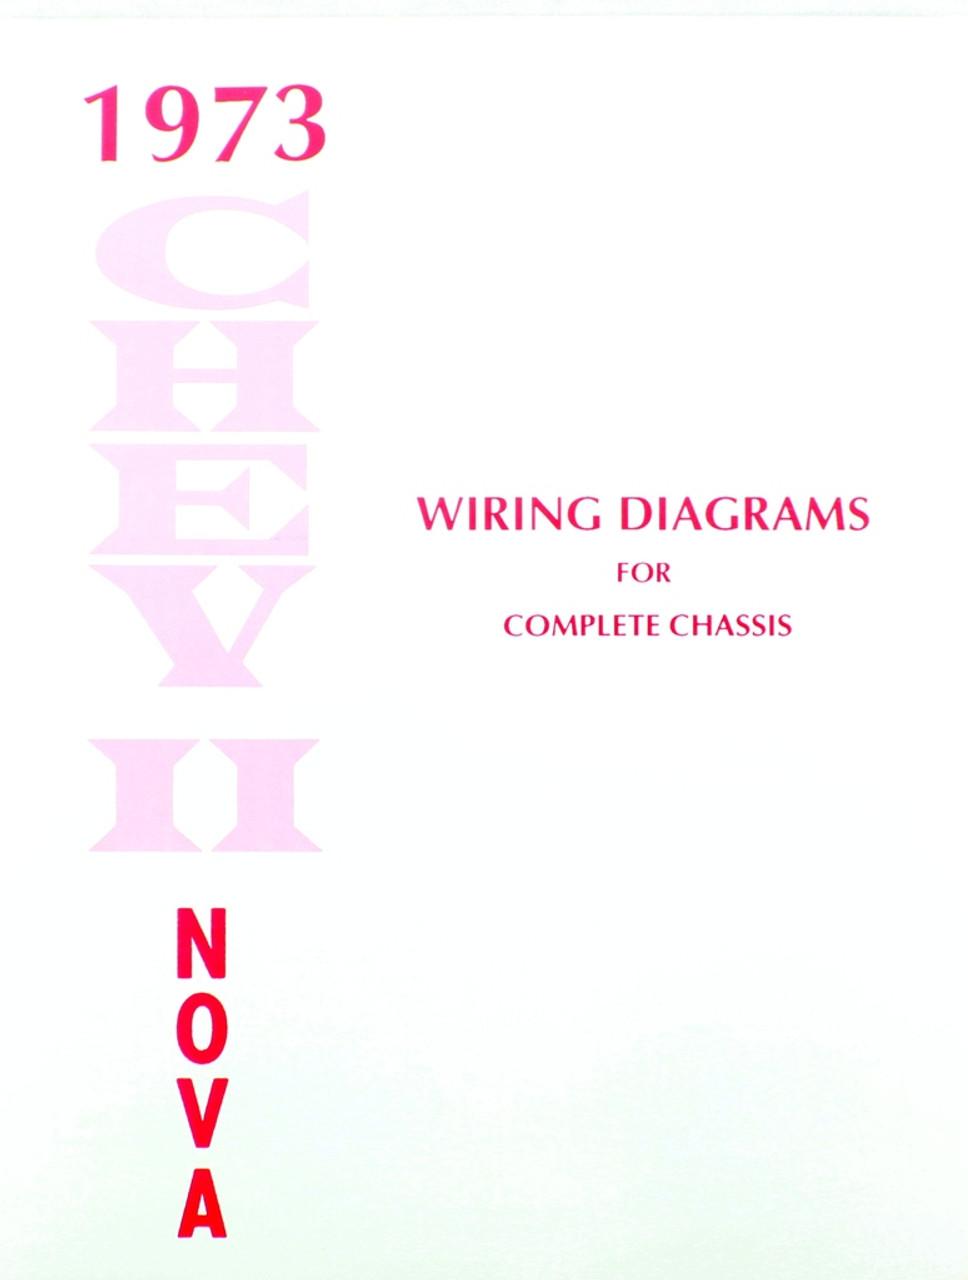 73 chevy nova electrical wiring diagram manual 1973 i 5 classic chevy rh i5chevy com 72 Nova Wiring Diagram 73 Nova Wiring Diagram HD